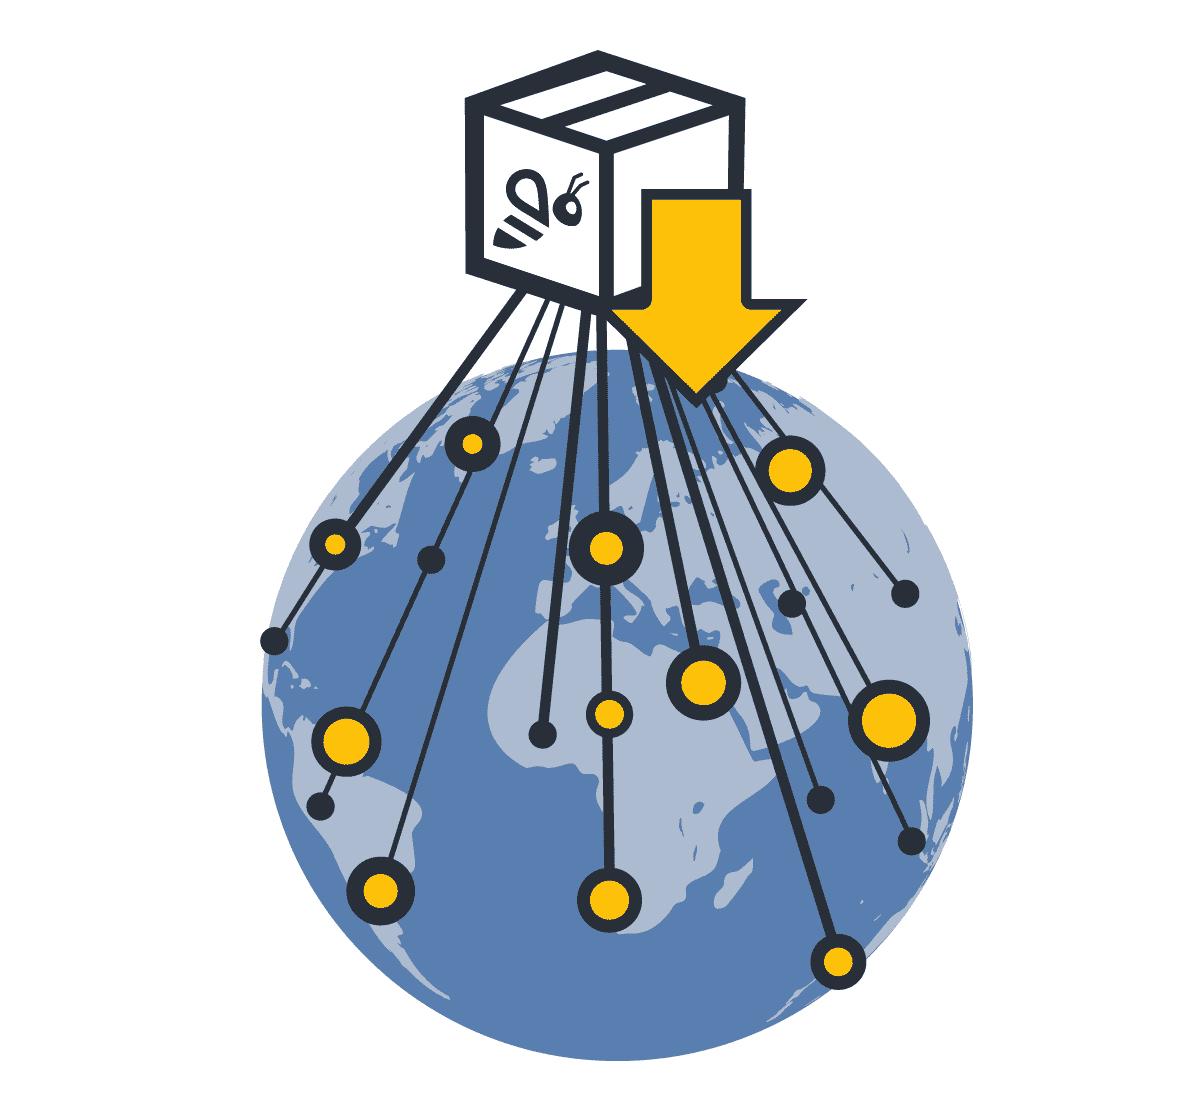 WATS software distribution